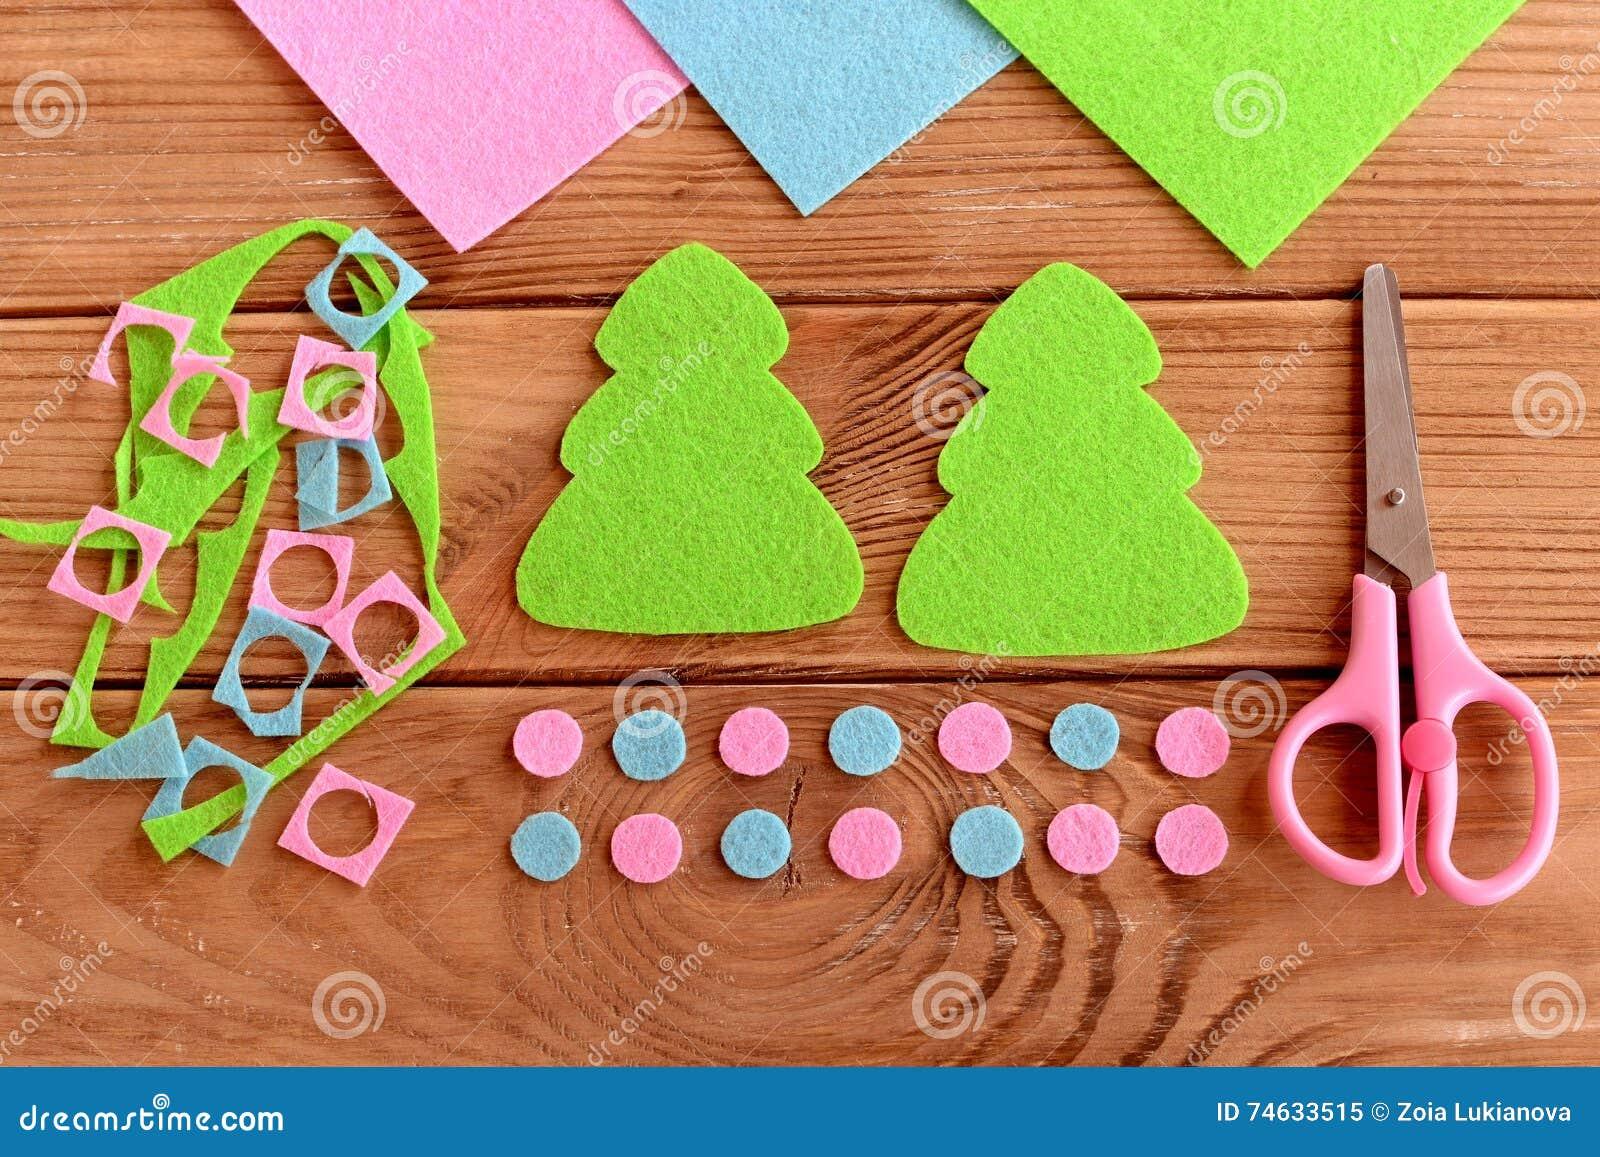 Felt Christmas Tree Decoration Patterns Felt Scraps